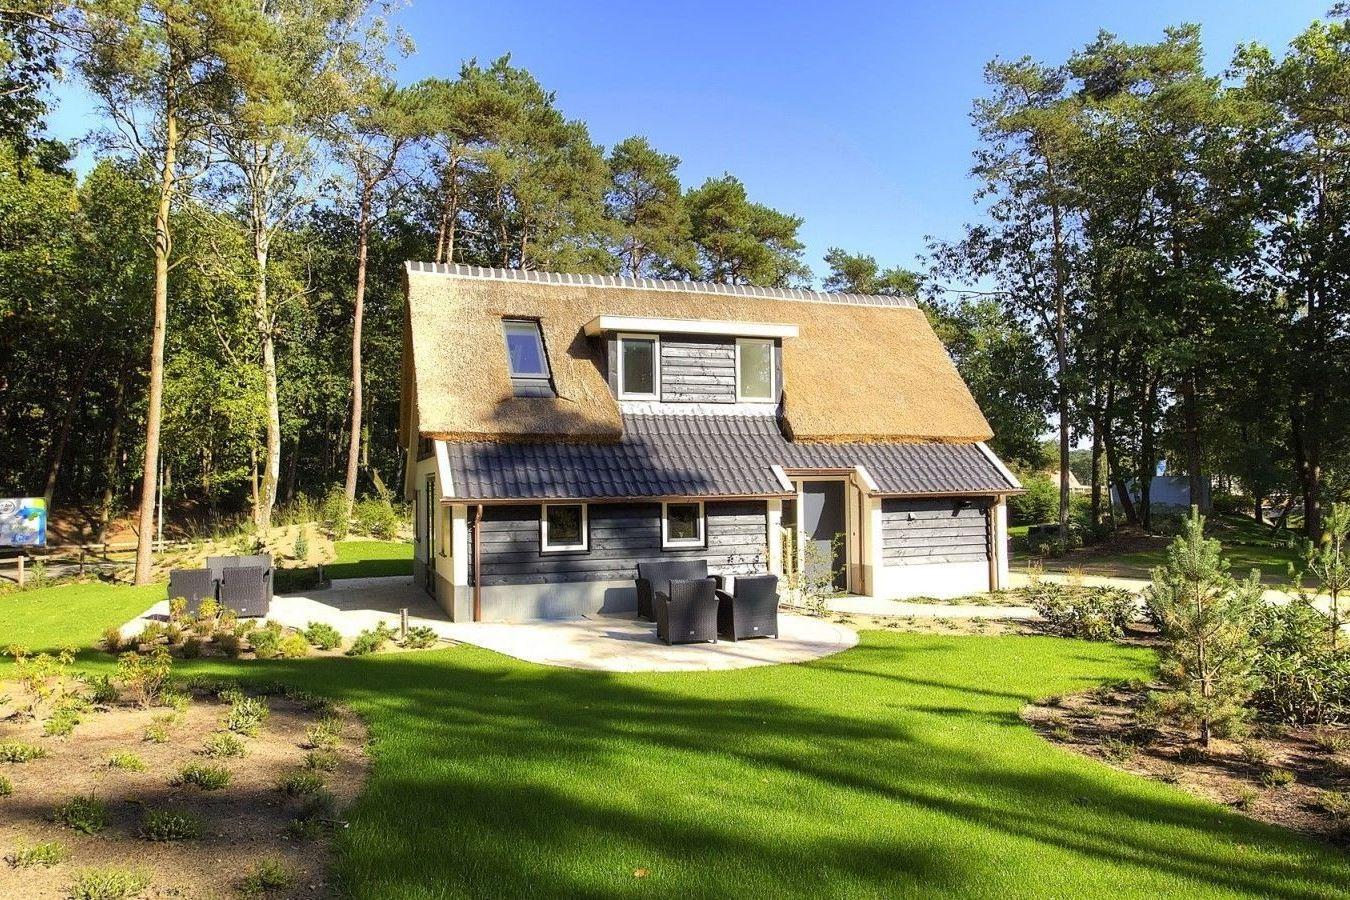 Bekijk foto 1 van Villa Avantage Nouveau